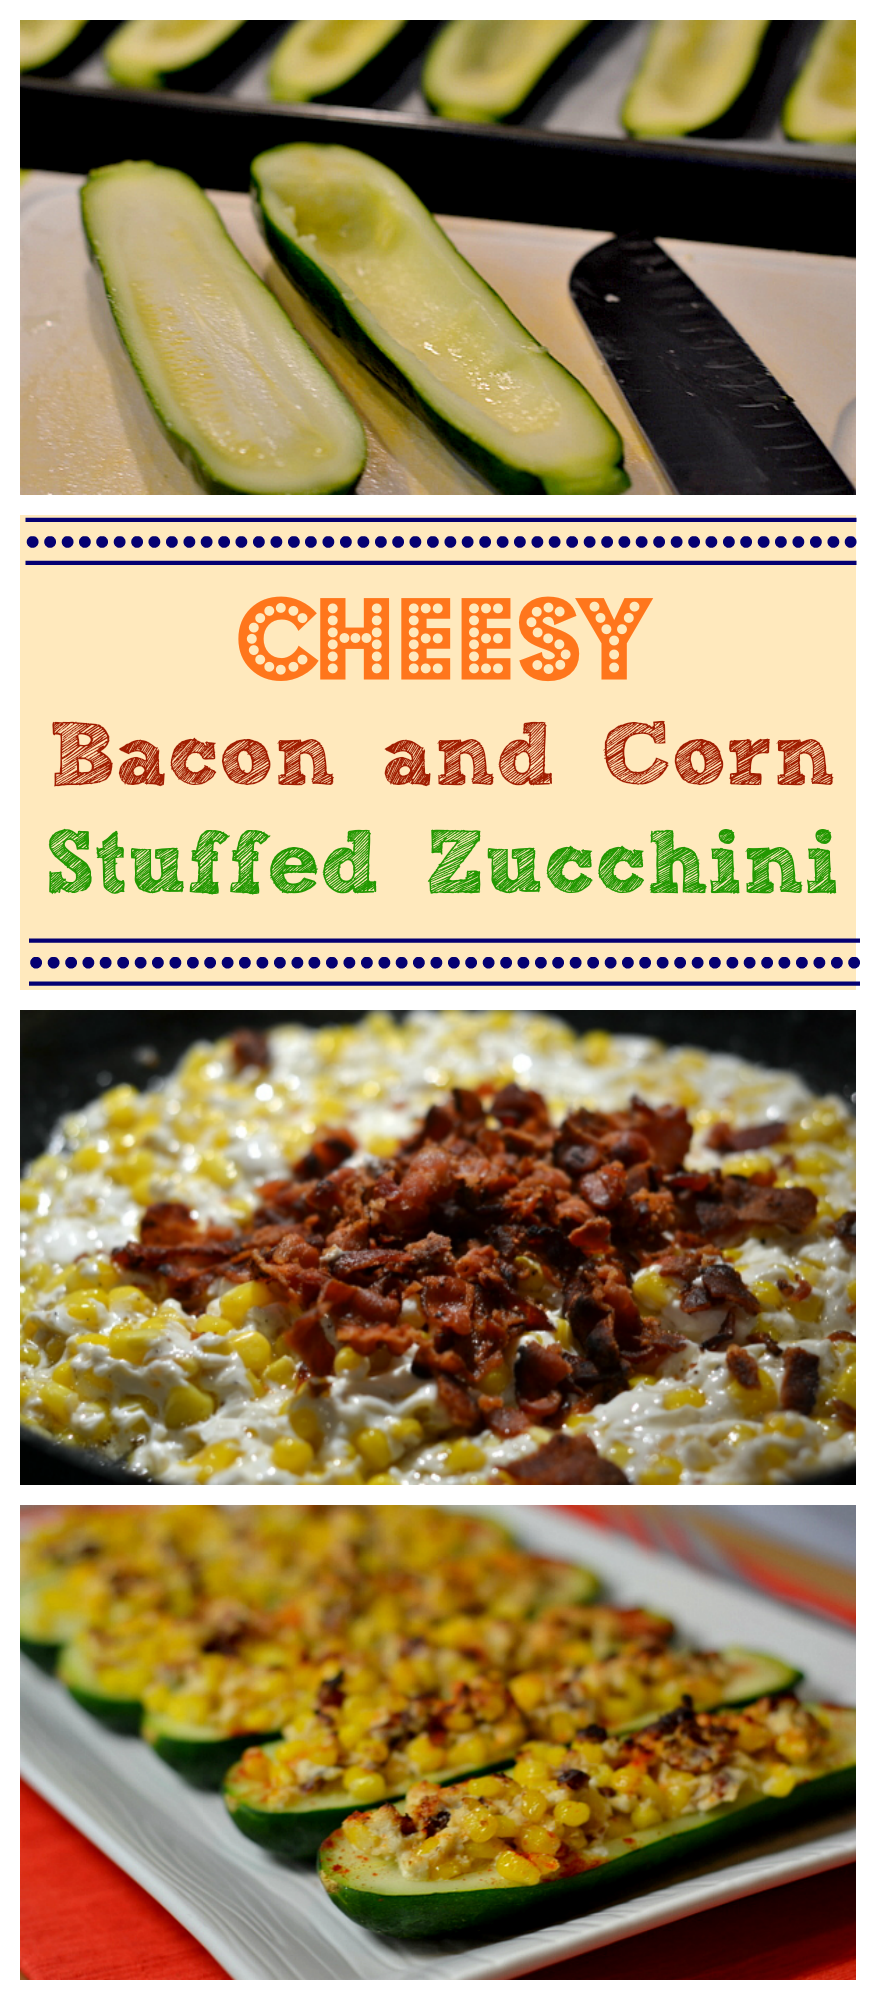 Cheesy Bacon and Corn Stuffed Zucchini - A simply delicious side dish. Find the recipe at Chew Nibble Nosh.